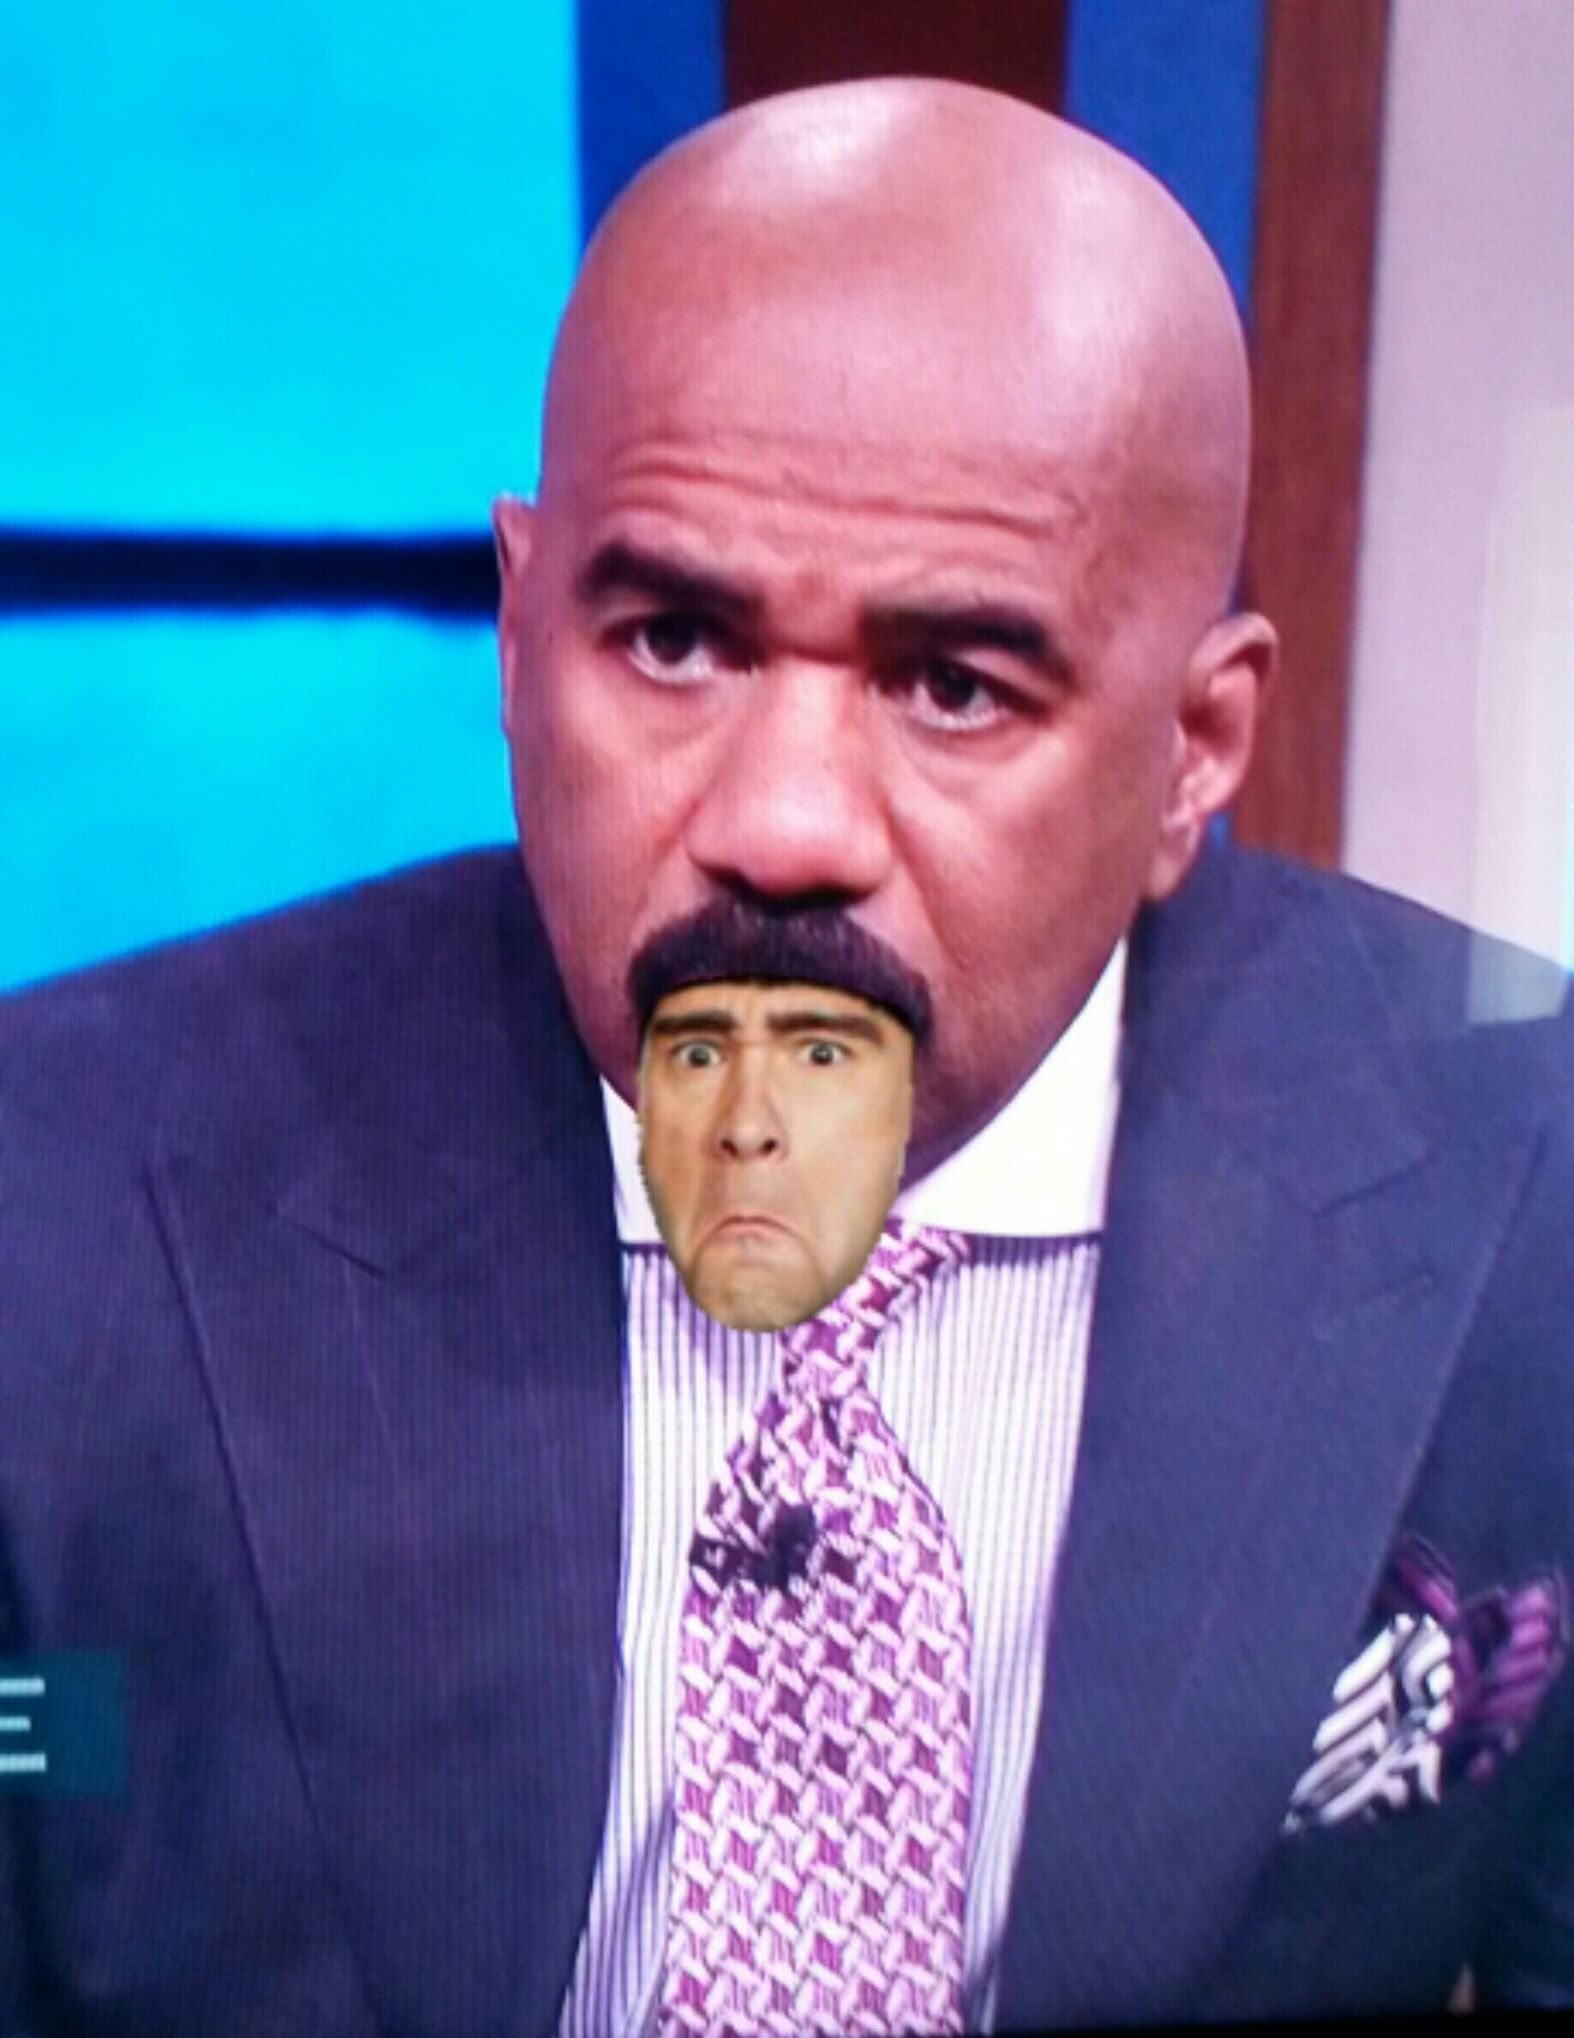 Steve Harvey No Mustache : steve, harvey, mustache, Steve, Harvey's, Mustache, #familyfued, #threestooges, #awesome, Laugh,, Harvey,, Family